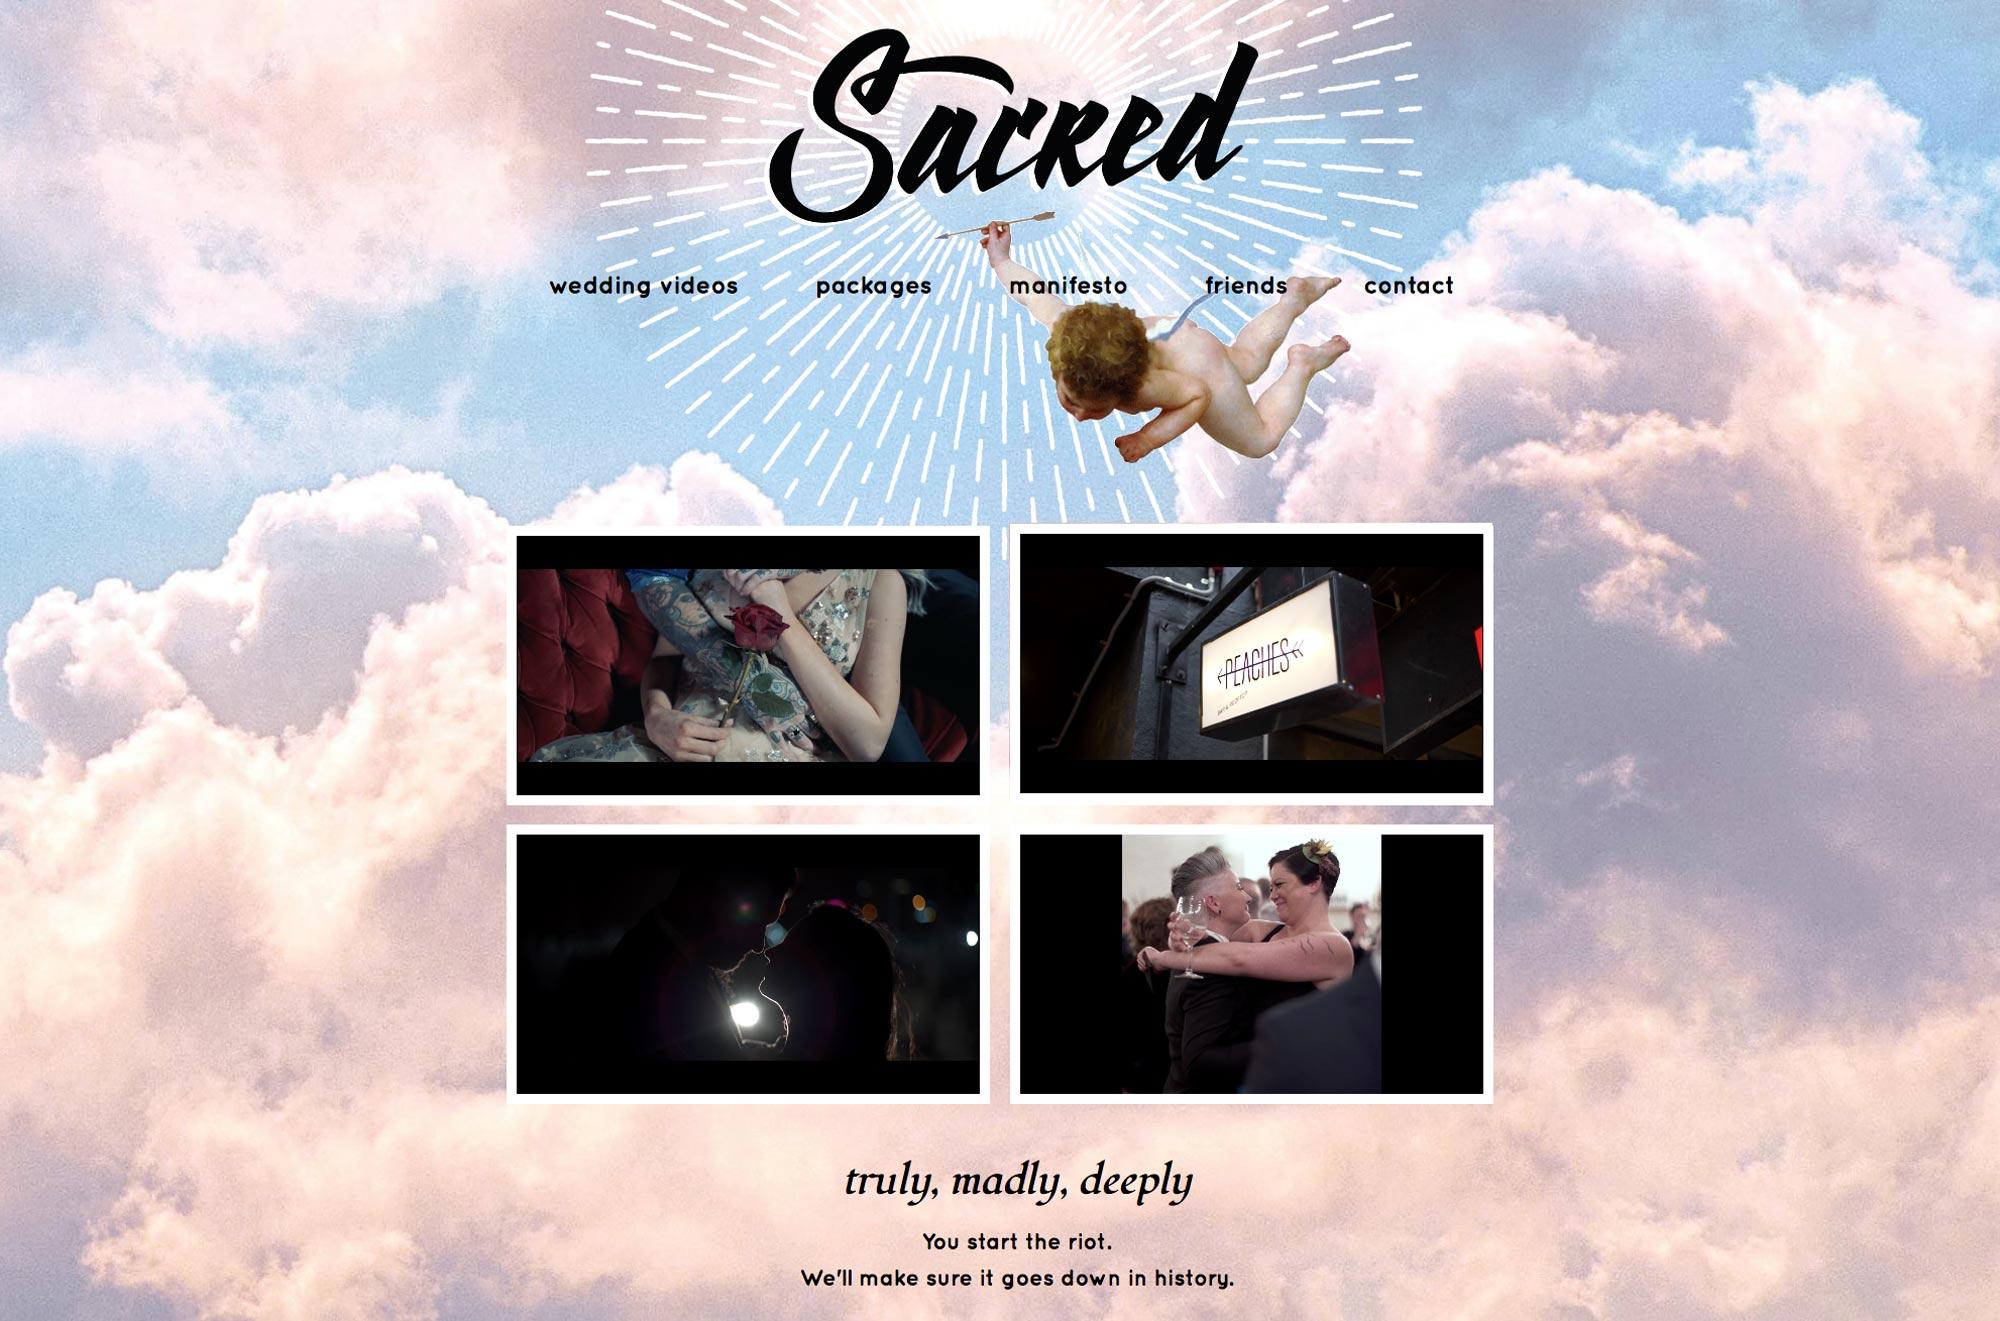 Sacred-Weddings-5